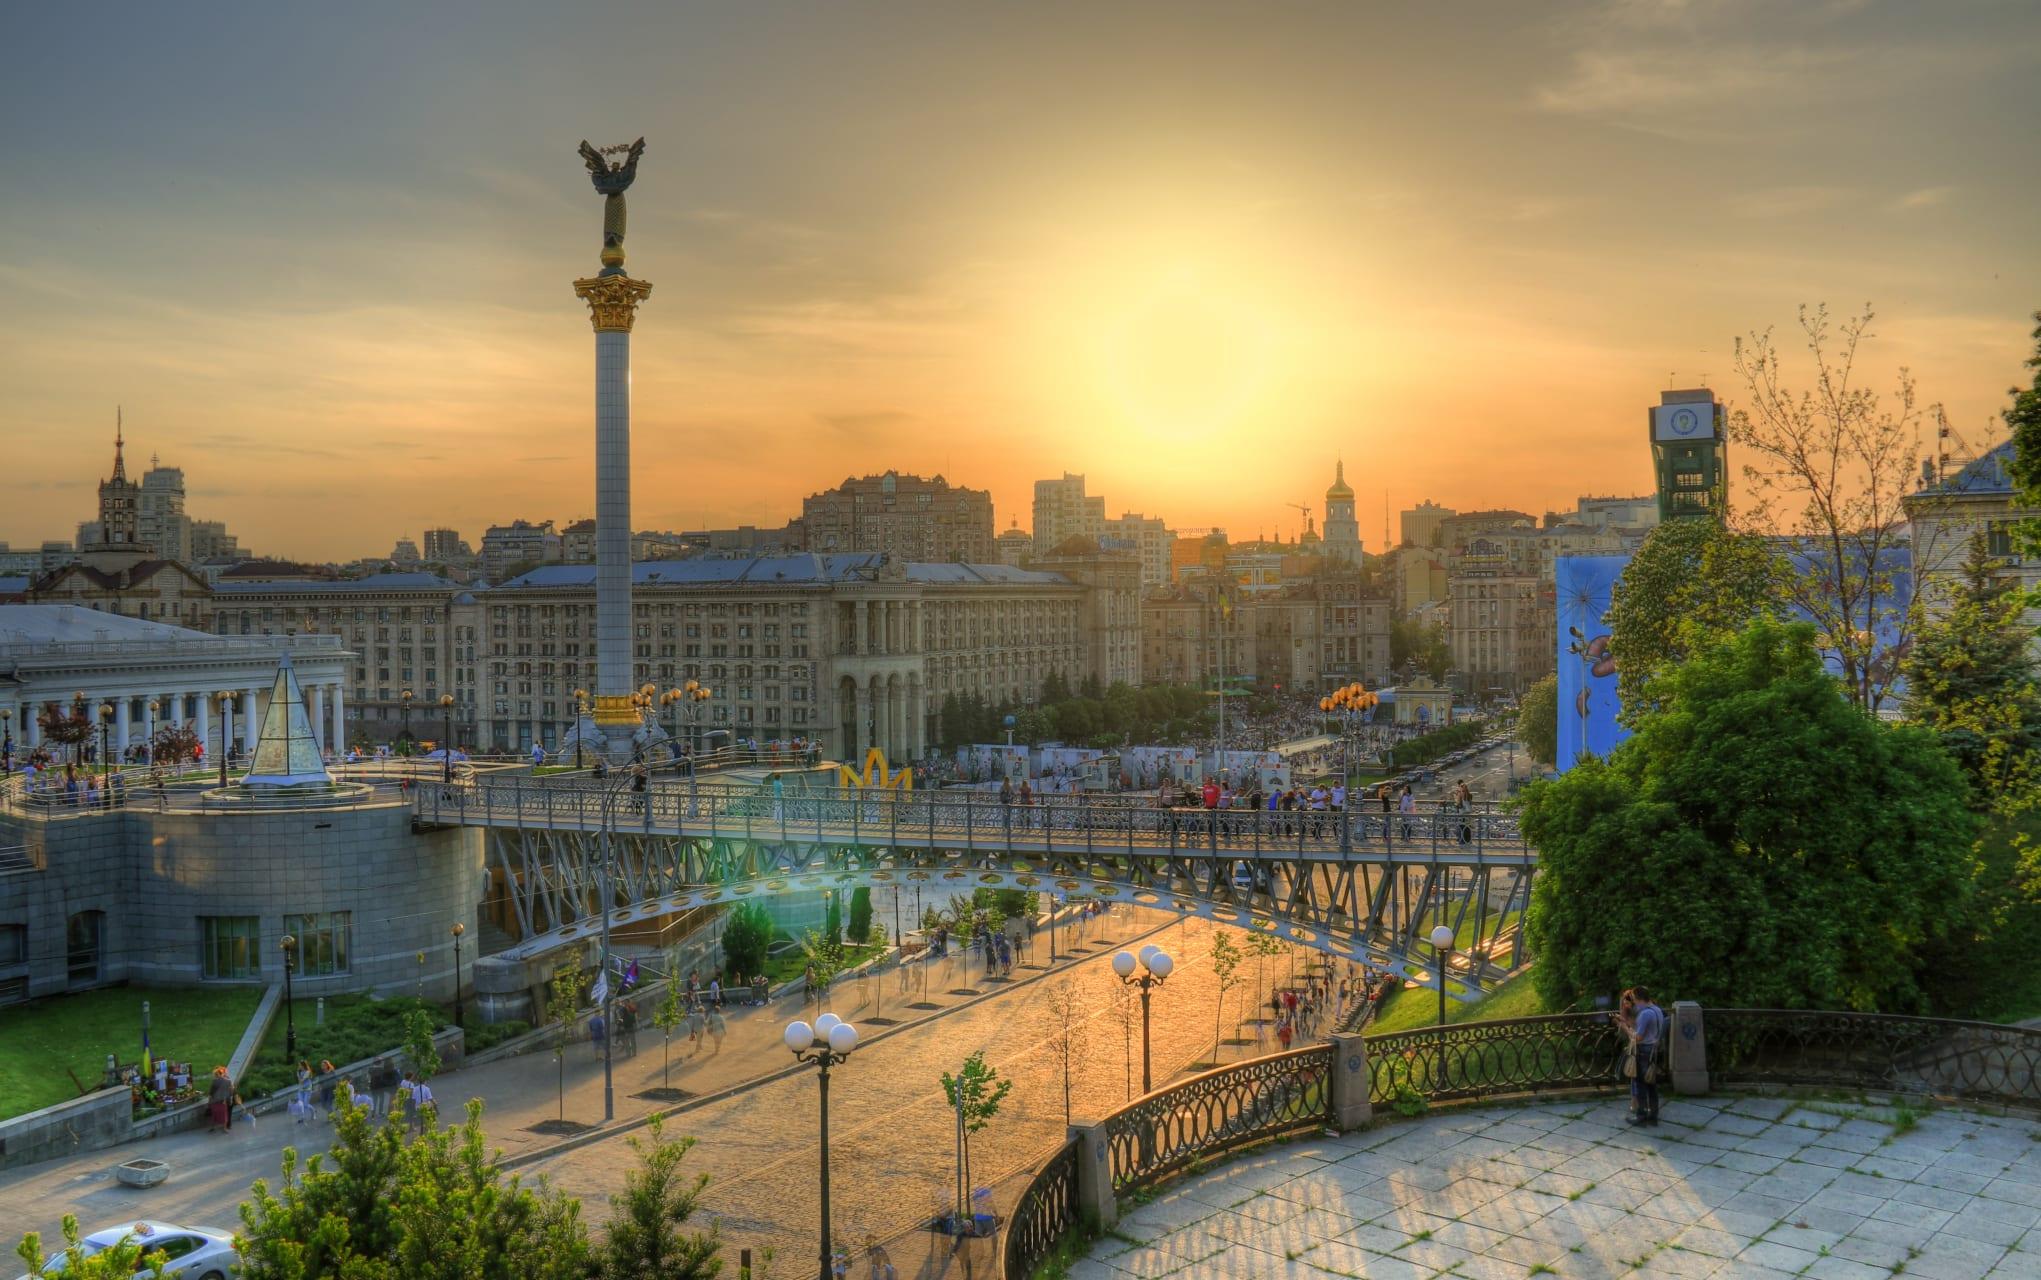 Kyiv cover image